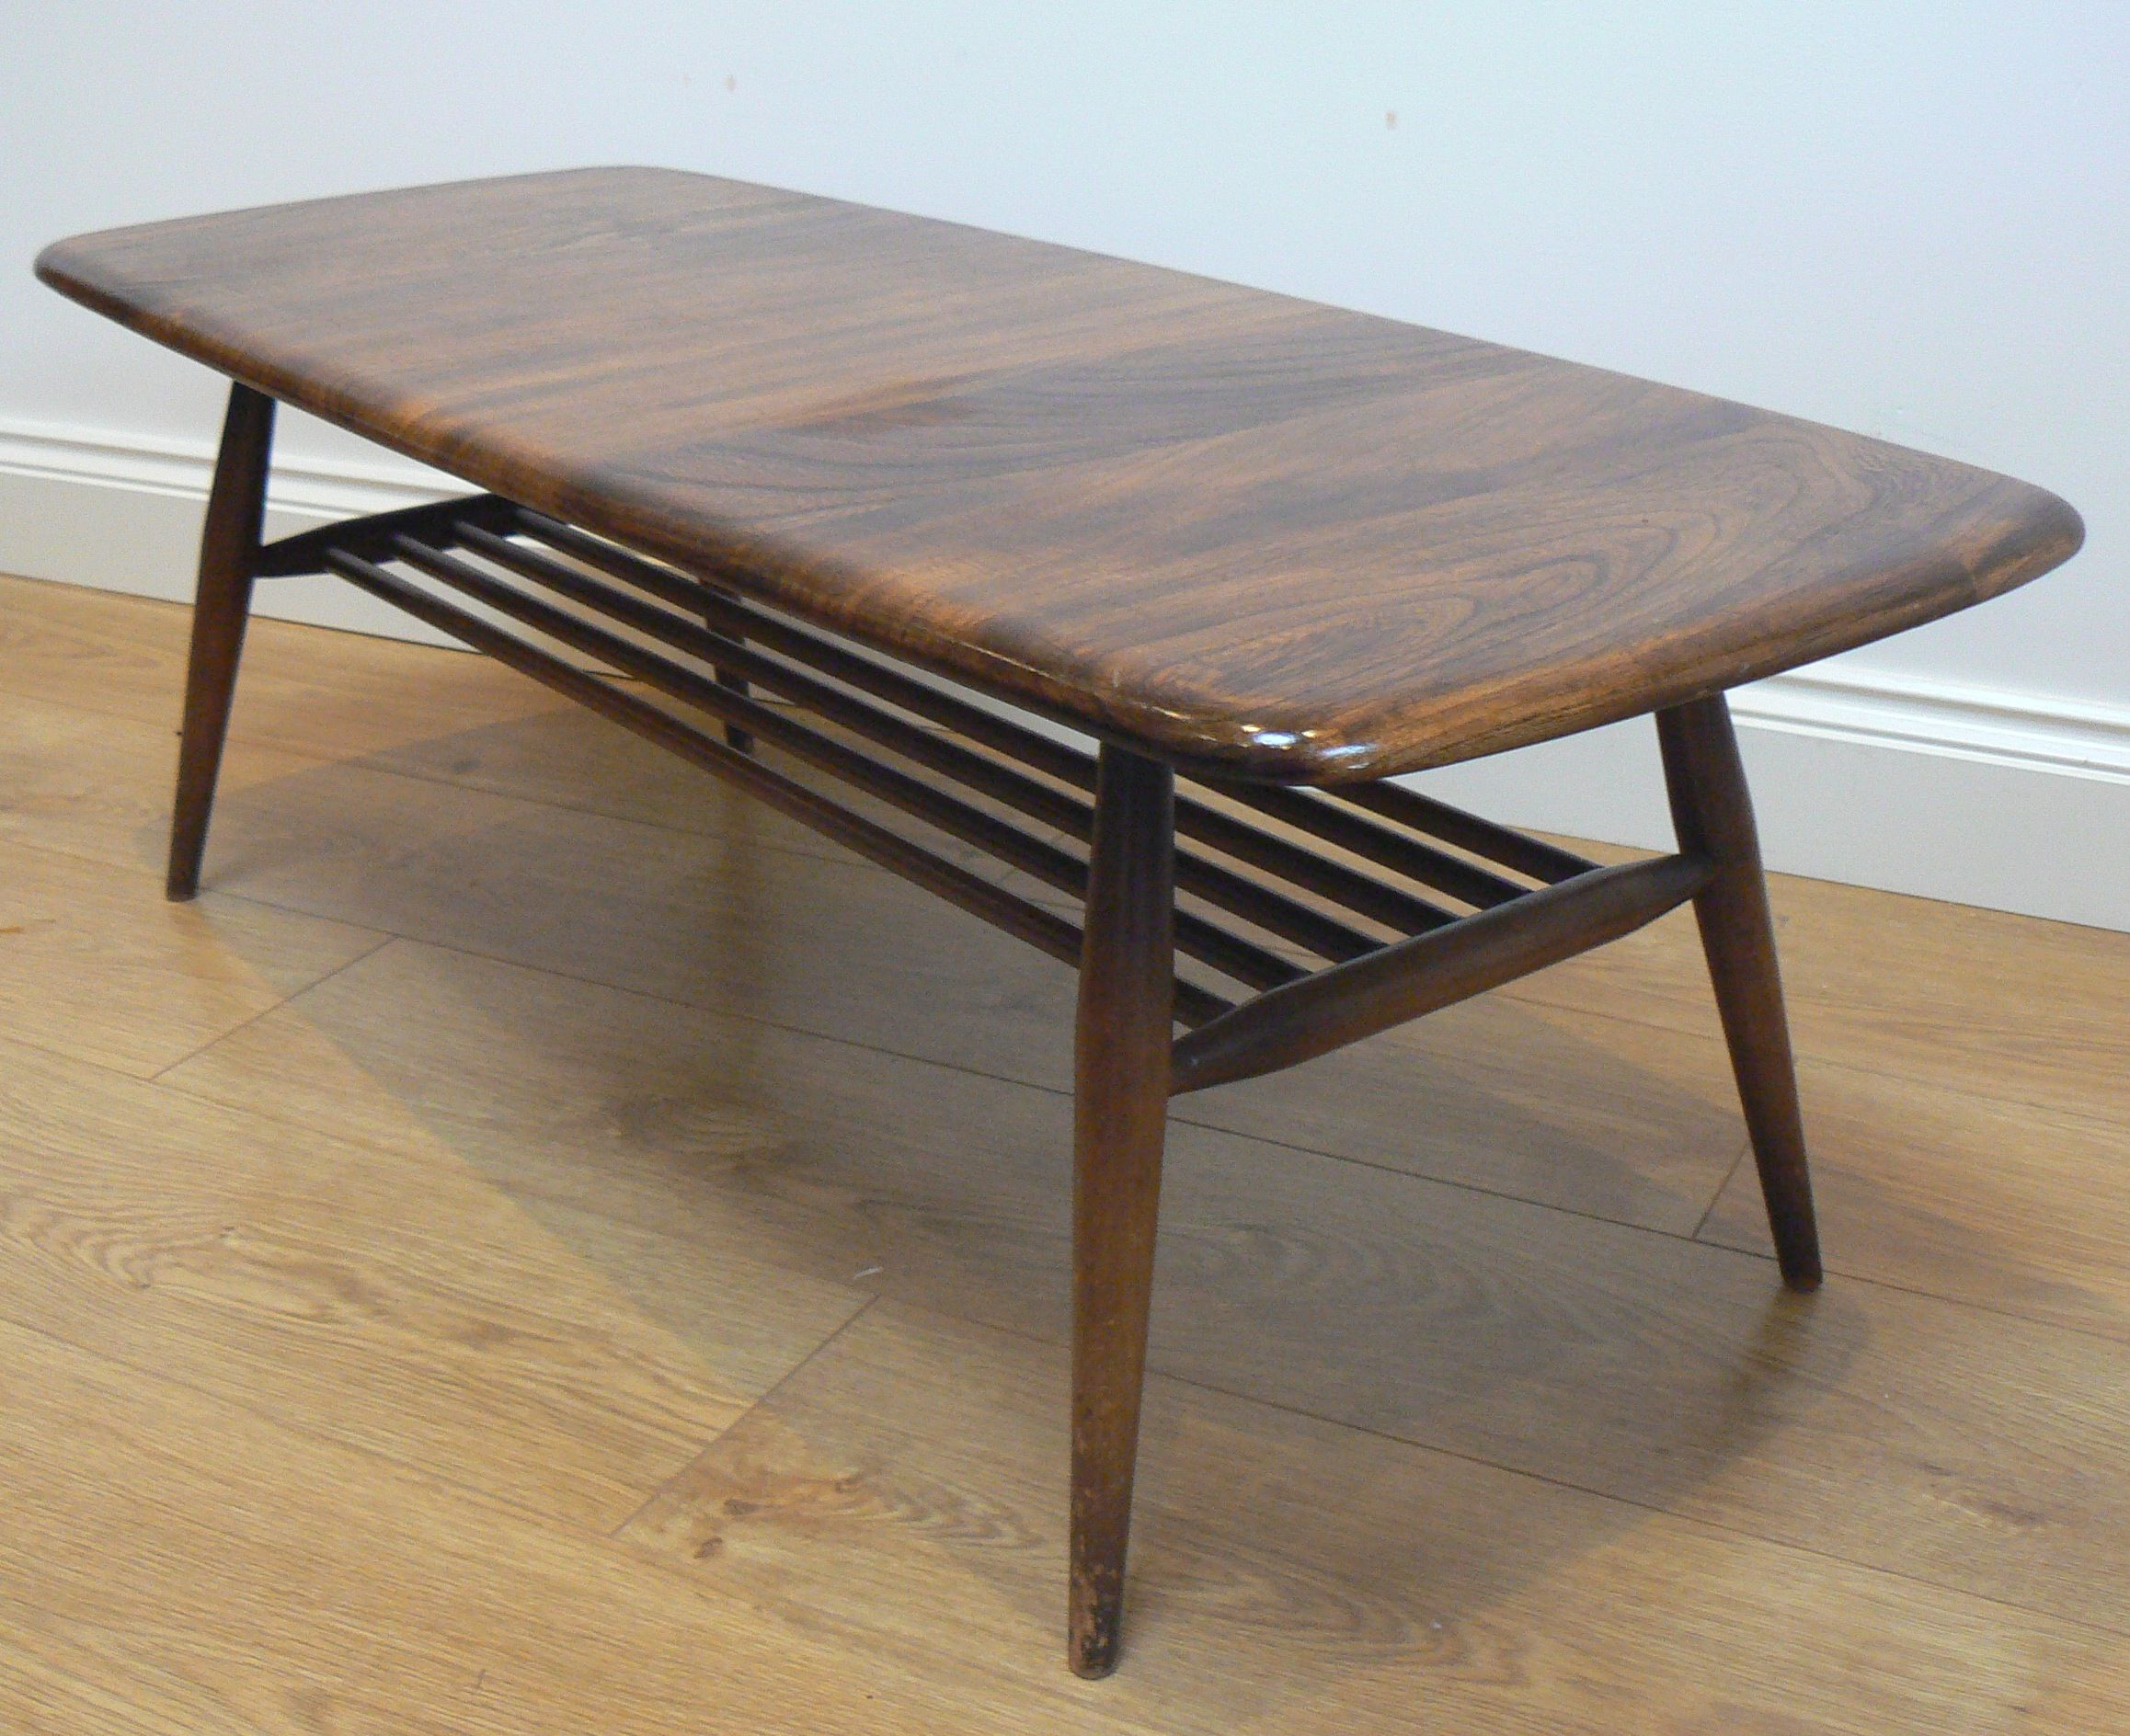 1960s Ercol coffee table